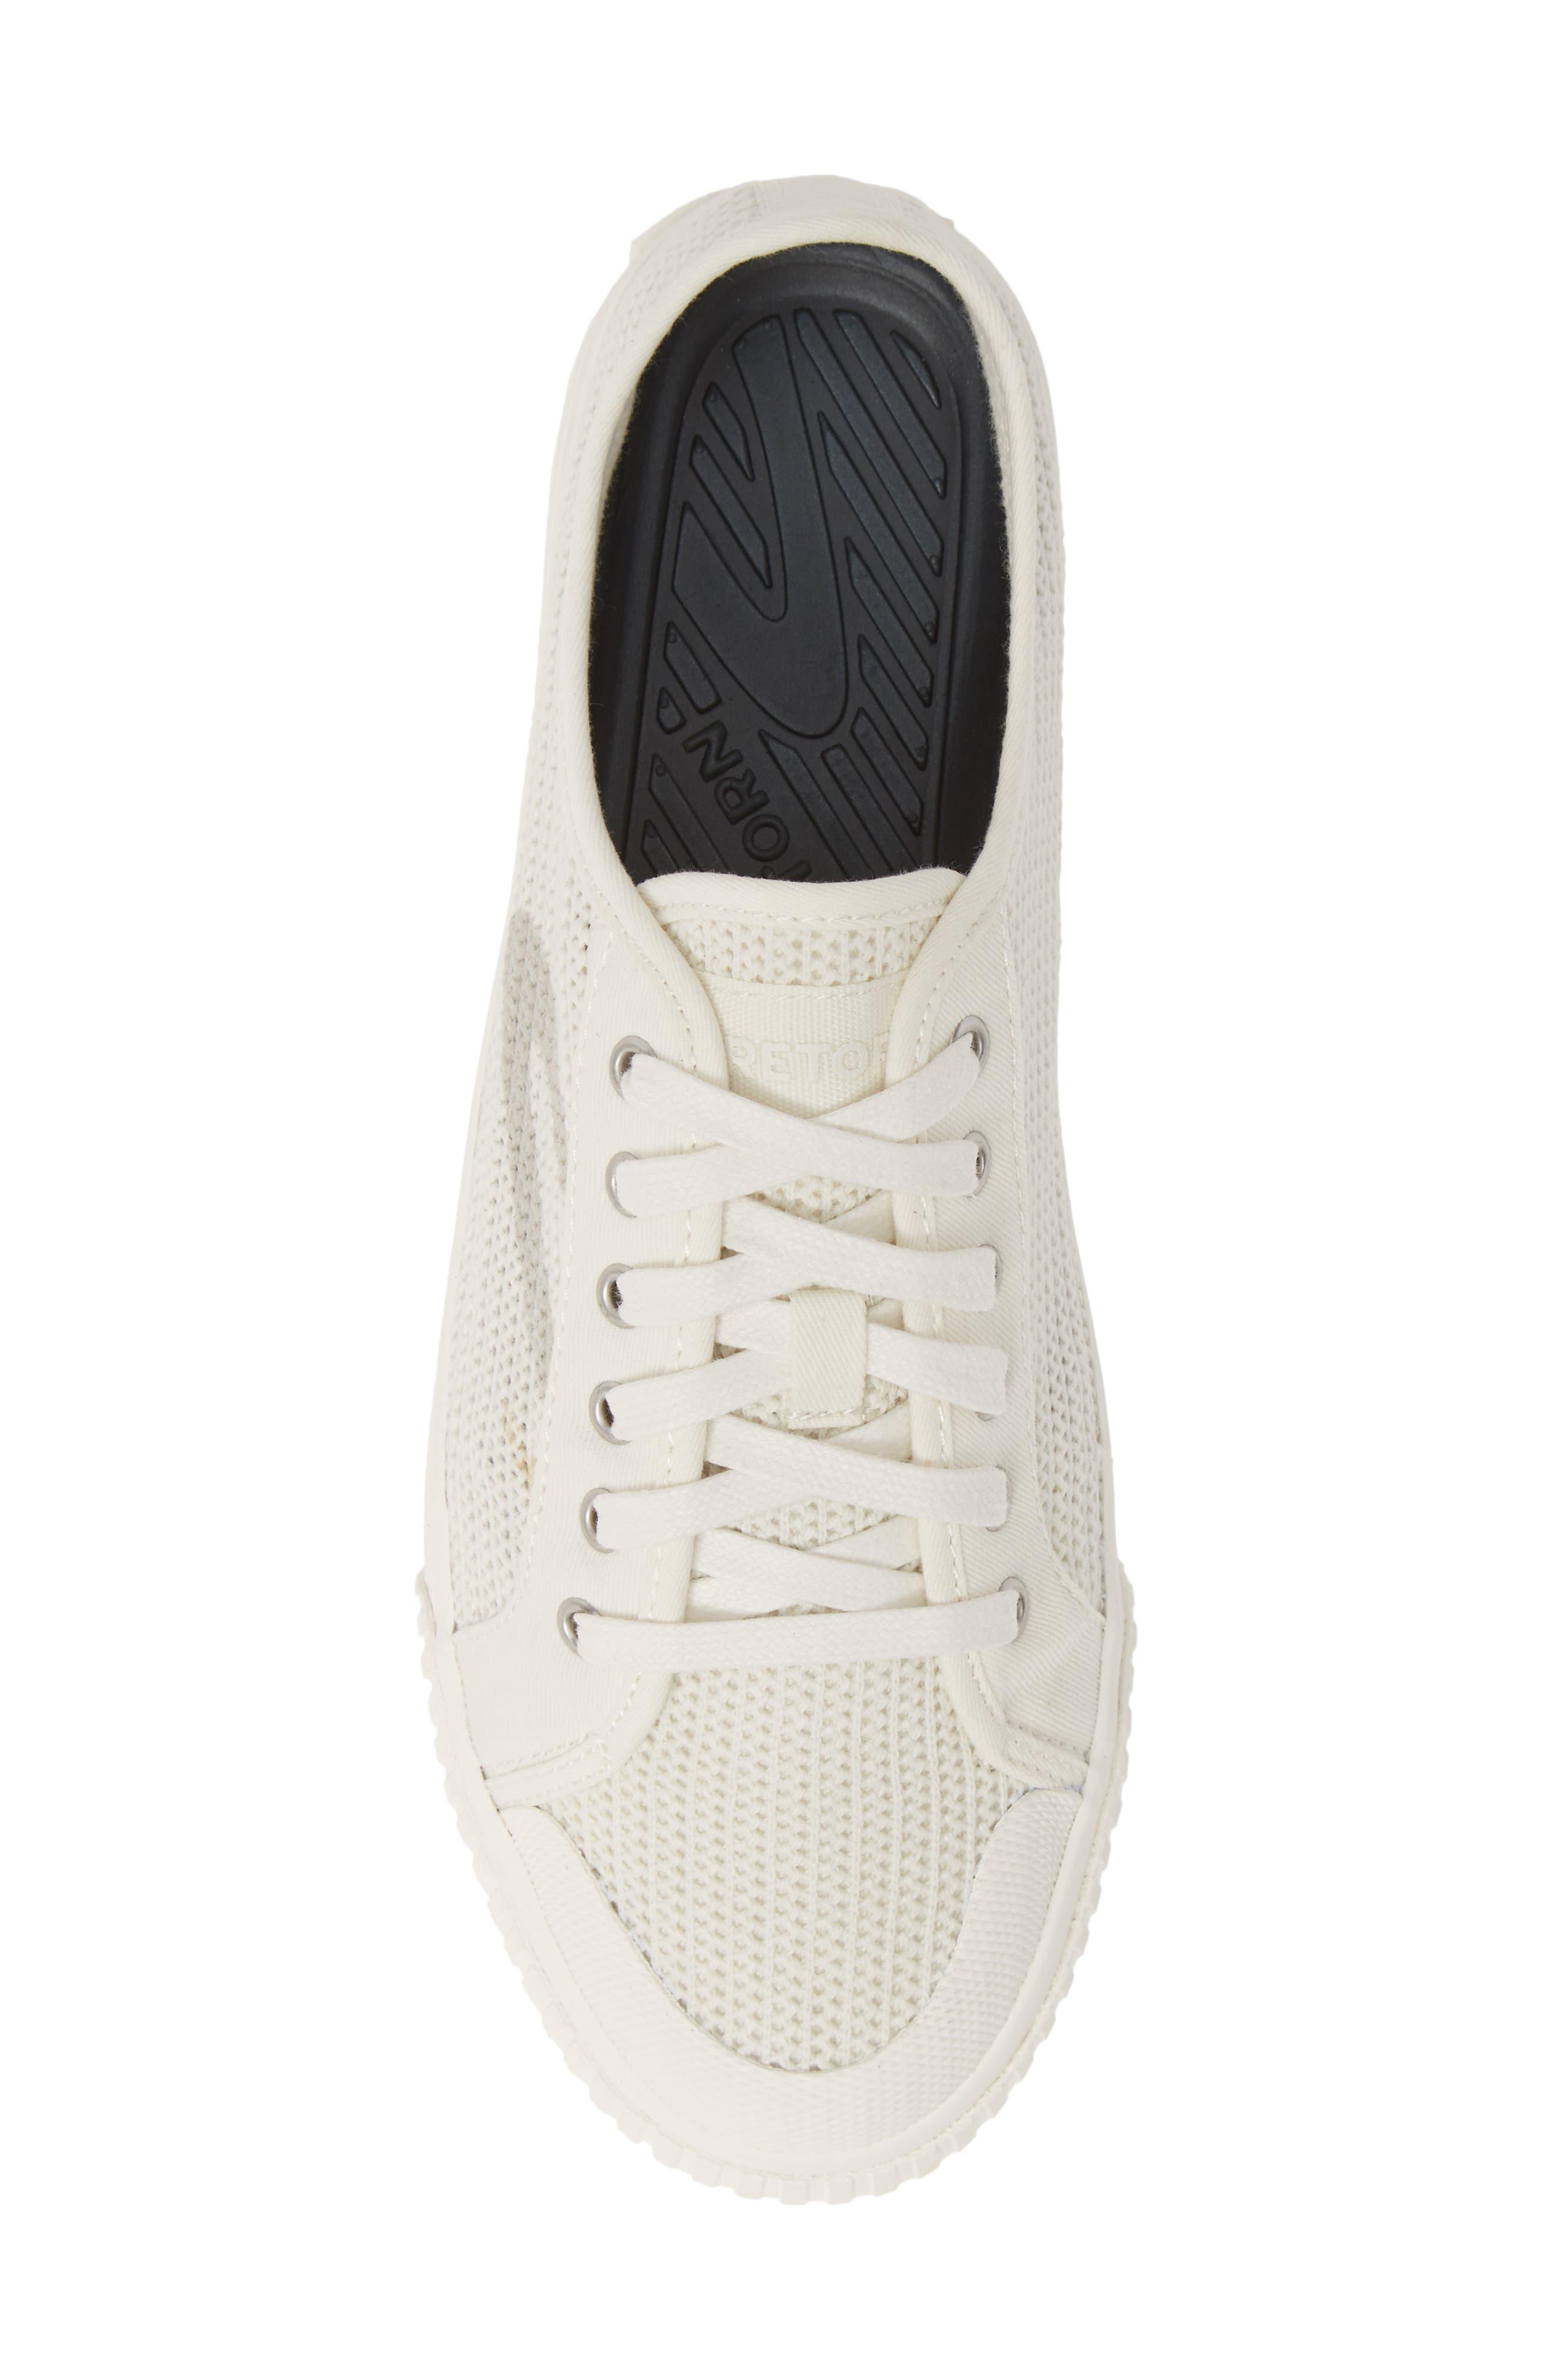 Tretorn Sneakers Tournet Woven Sneaker